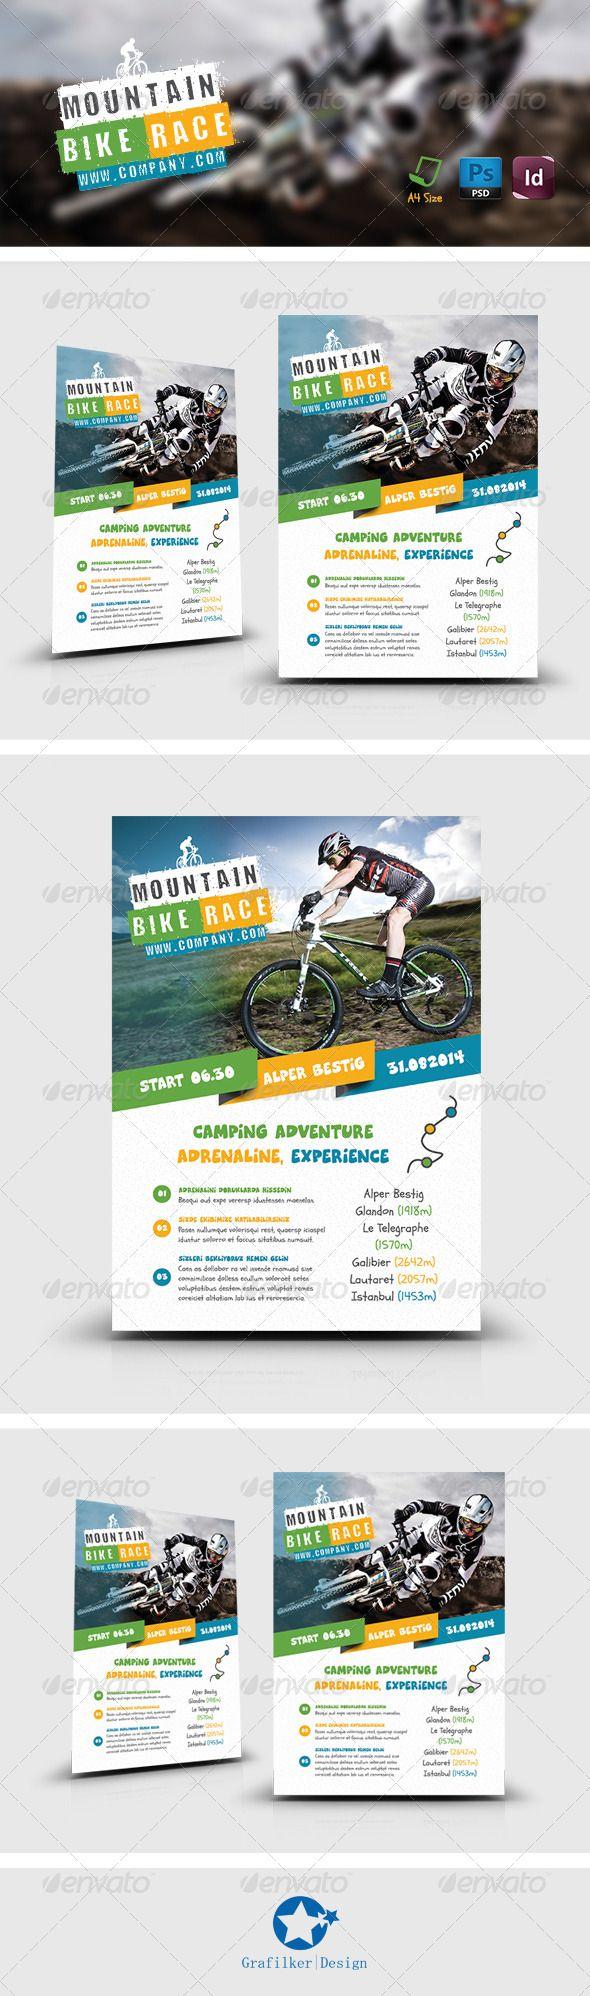 Bicycle Racing Flyer Templates   Volantes